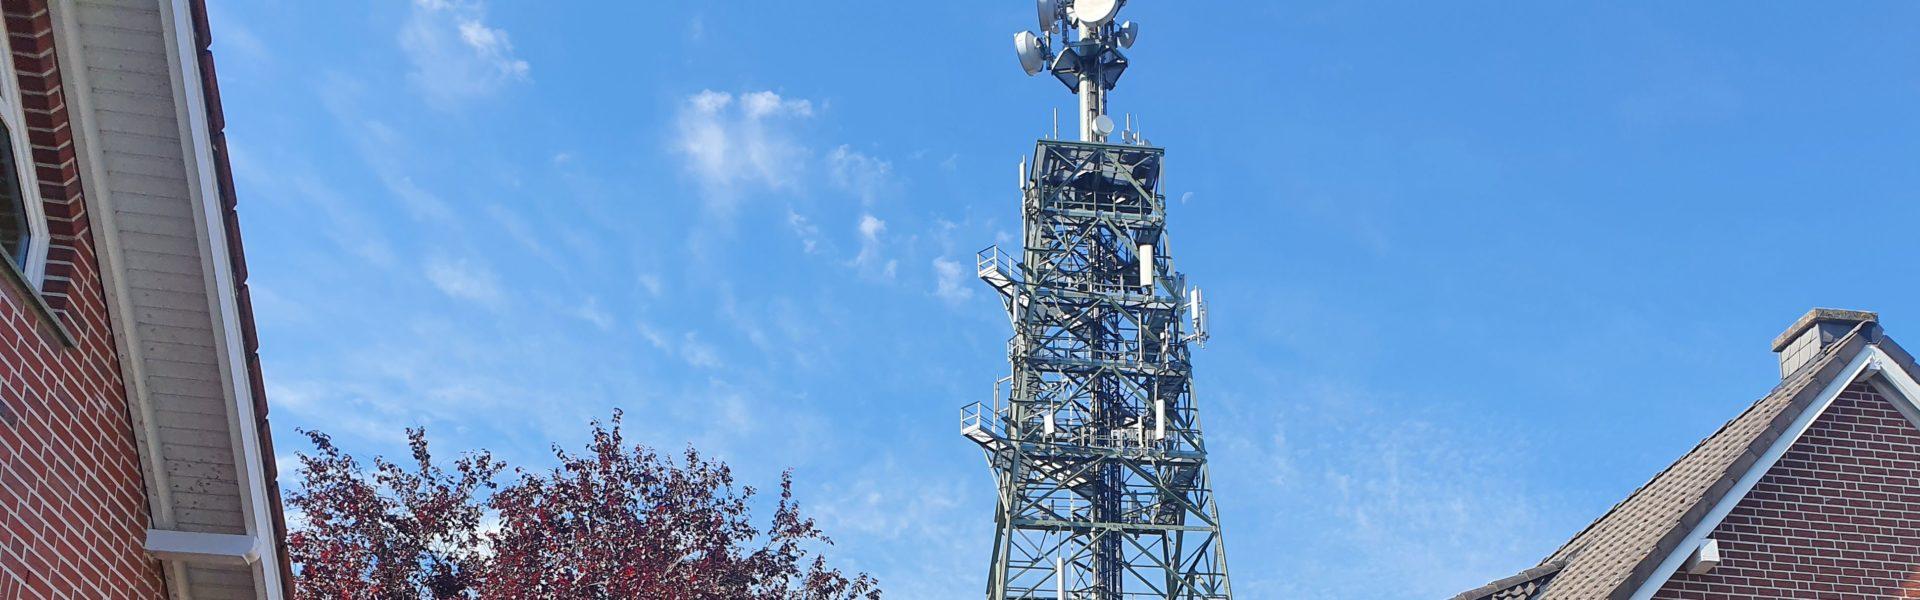 Mobilfunkversorgung